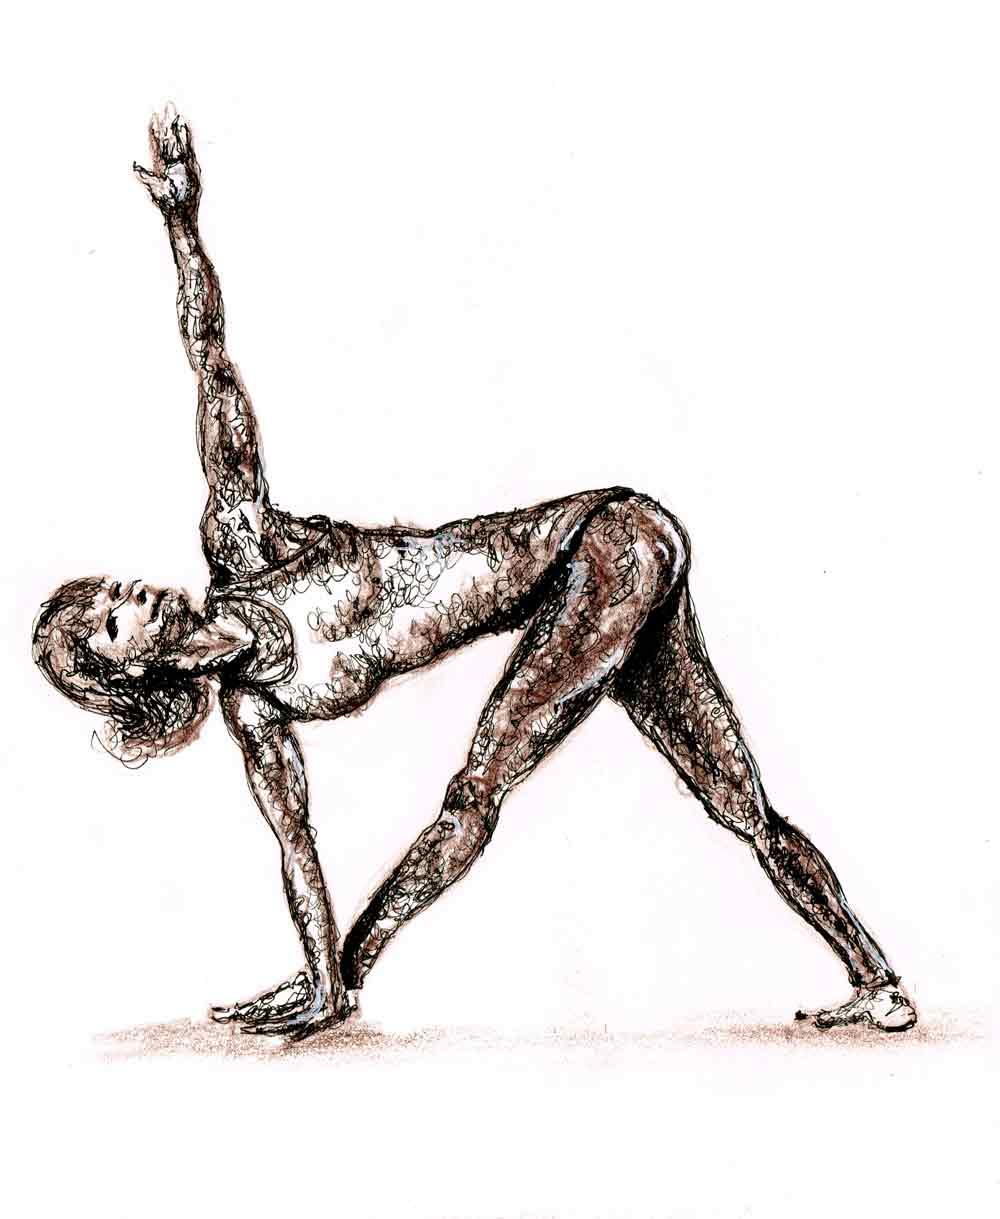 yoga-values-no-4-triangle-pose-kw.jpg